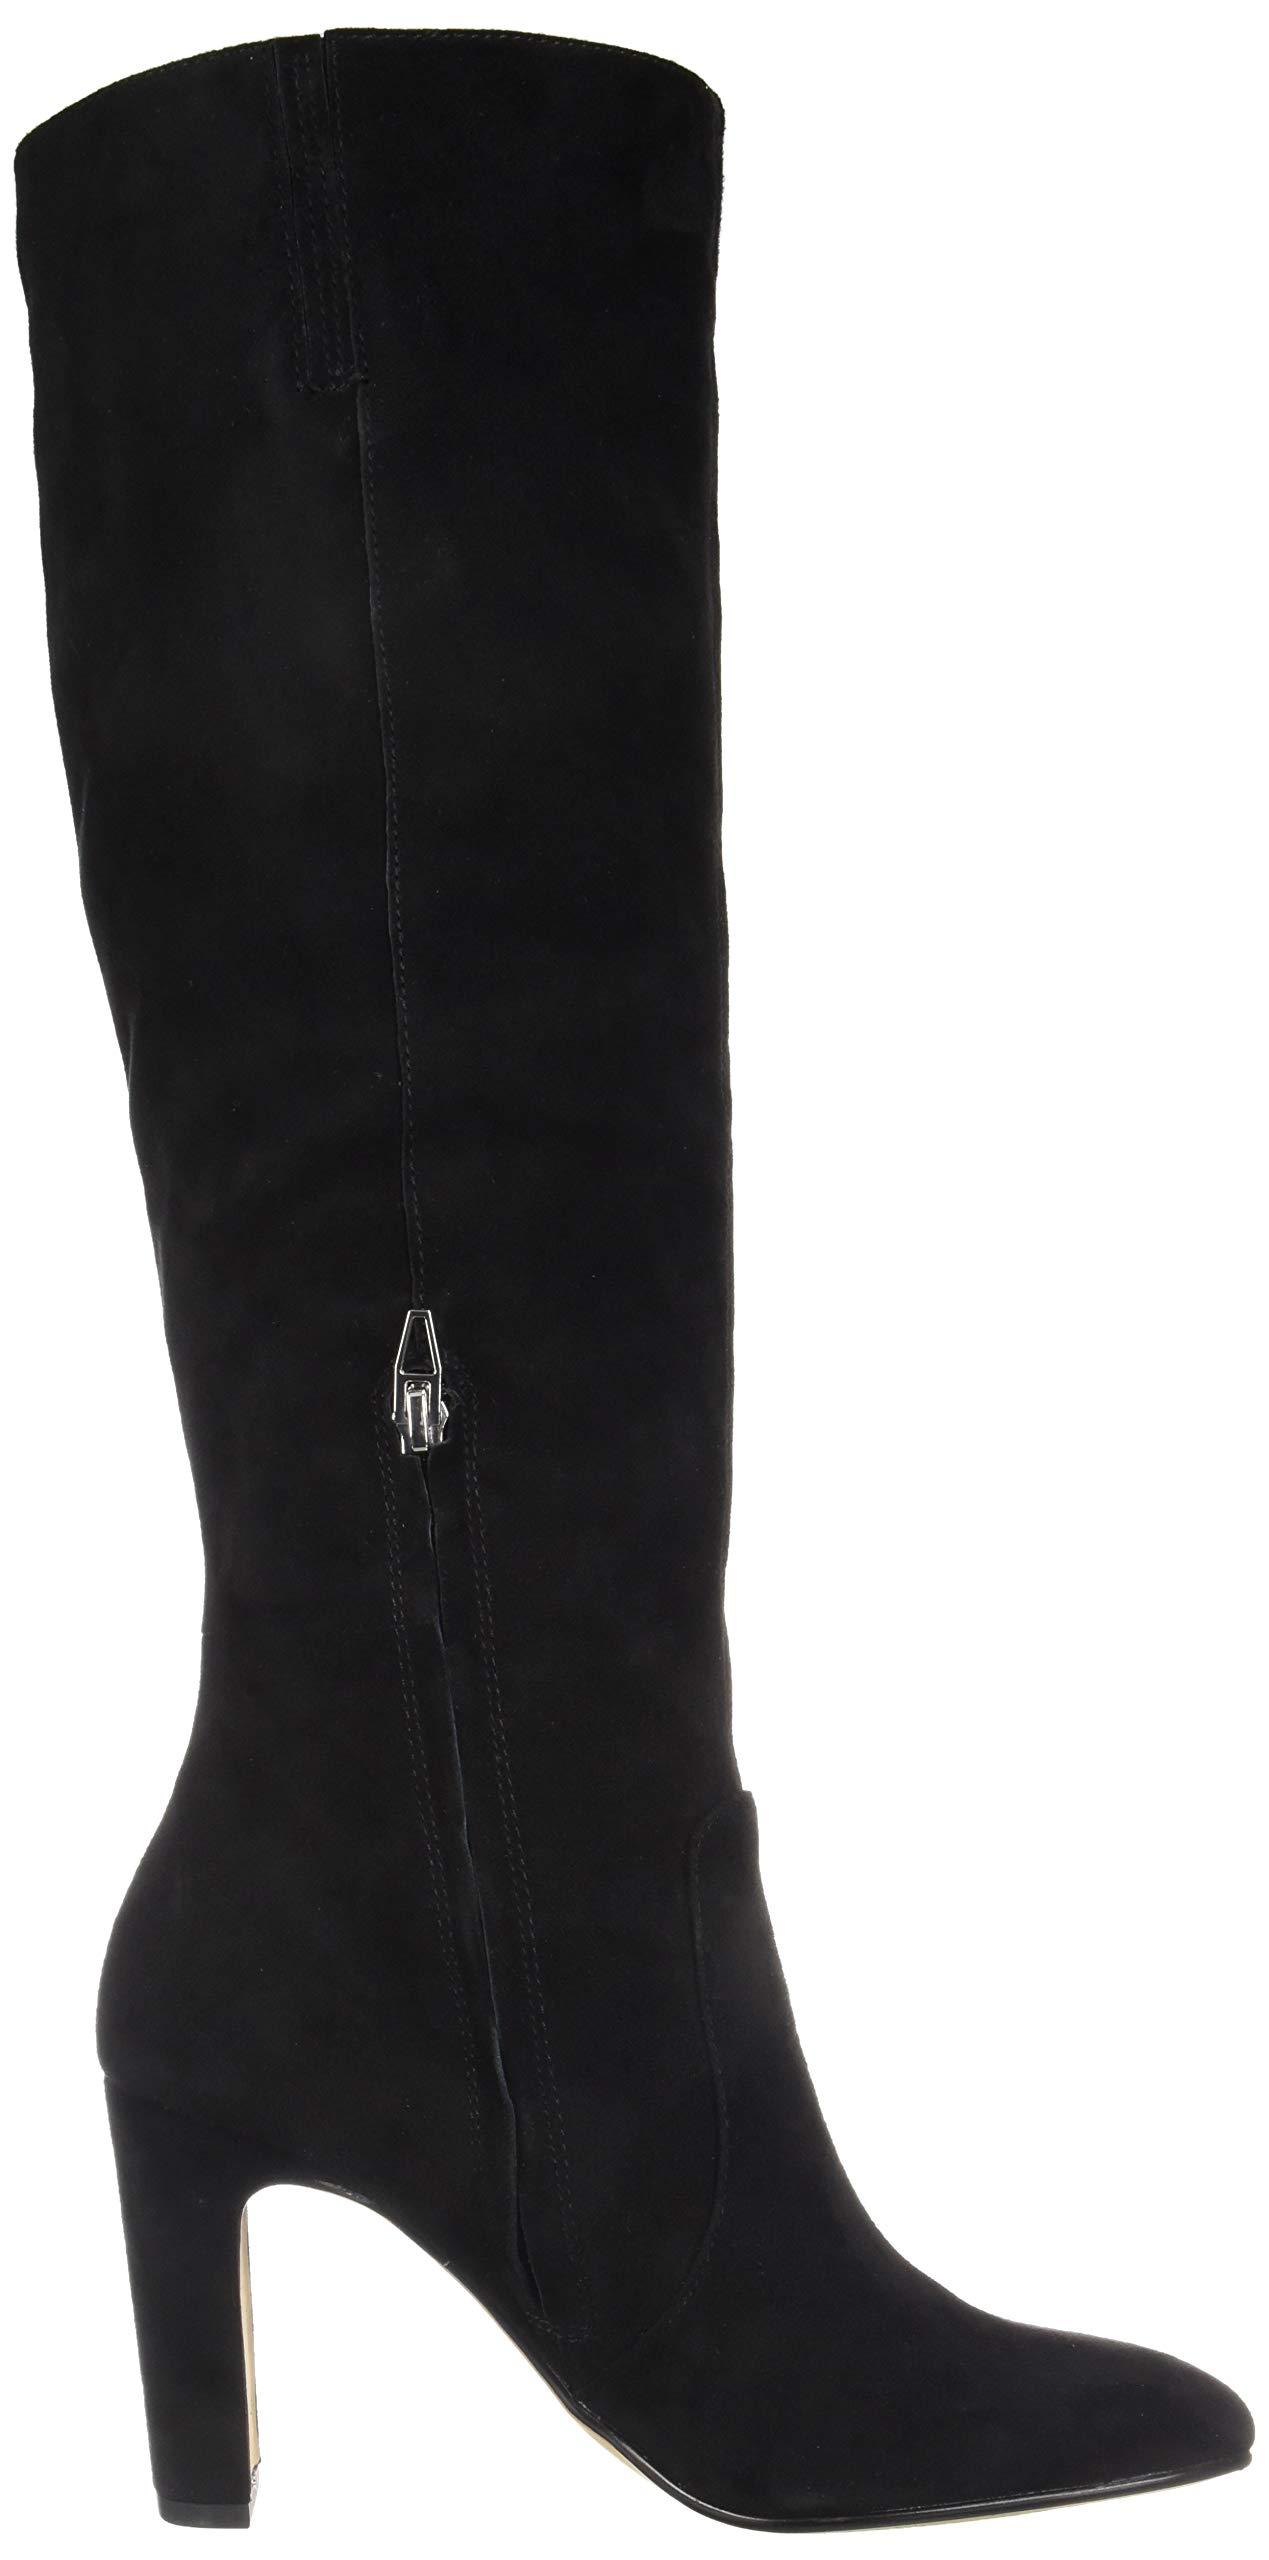 Dolce Vita Women's Coop Knee High Boot